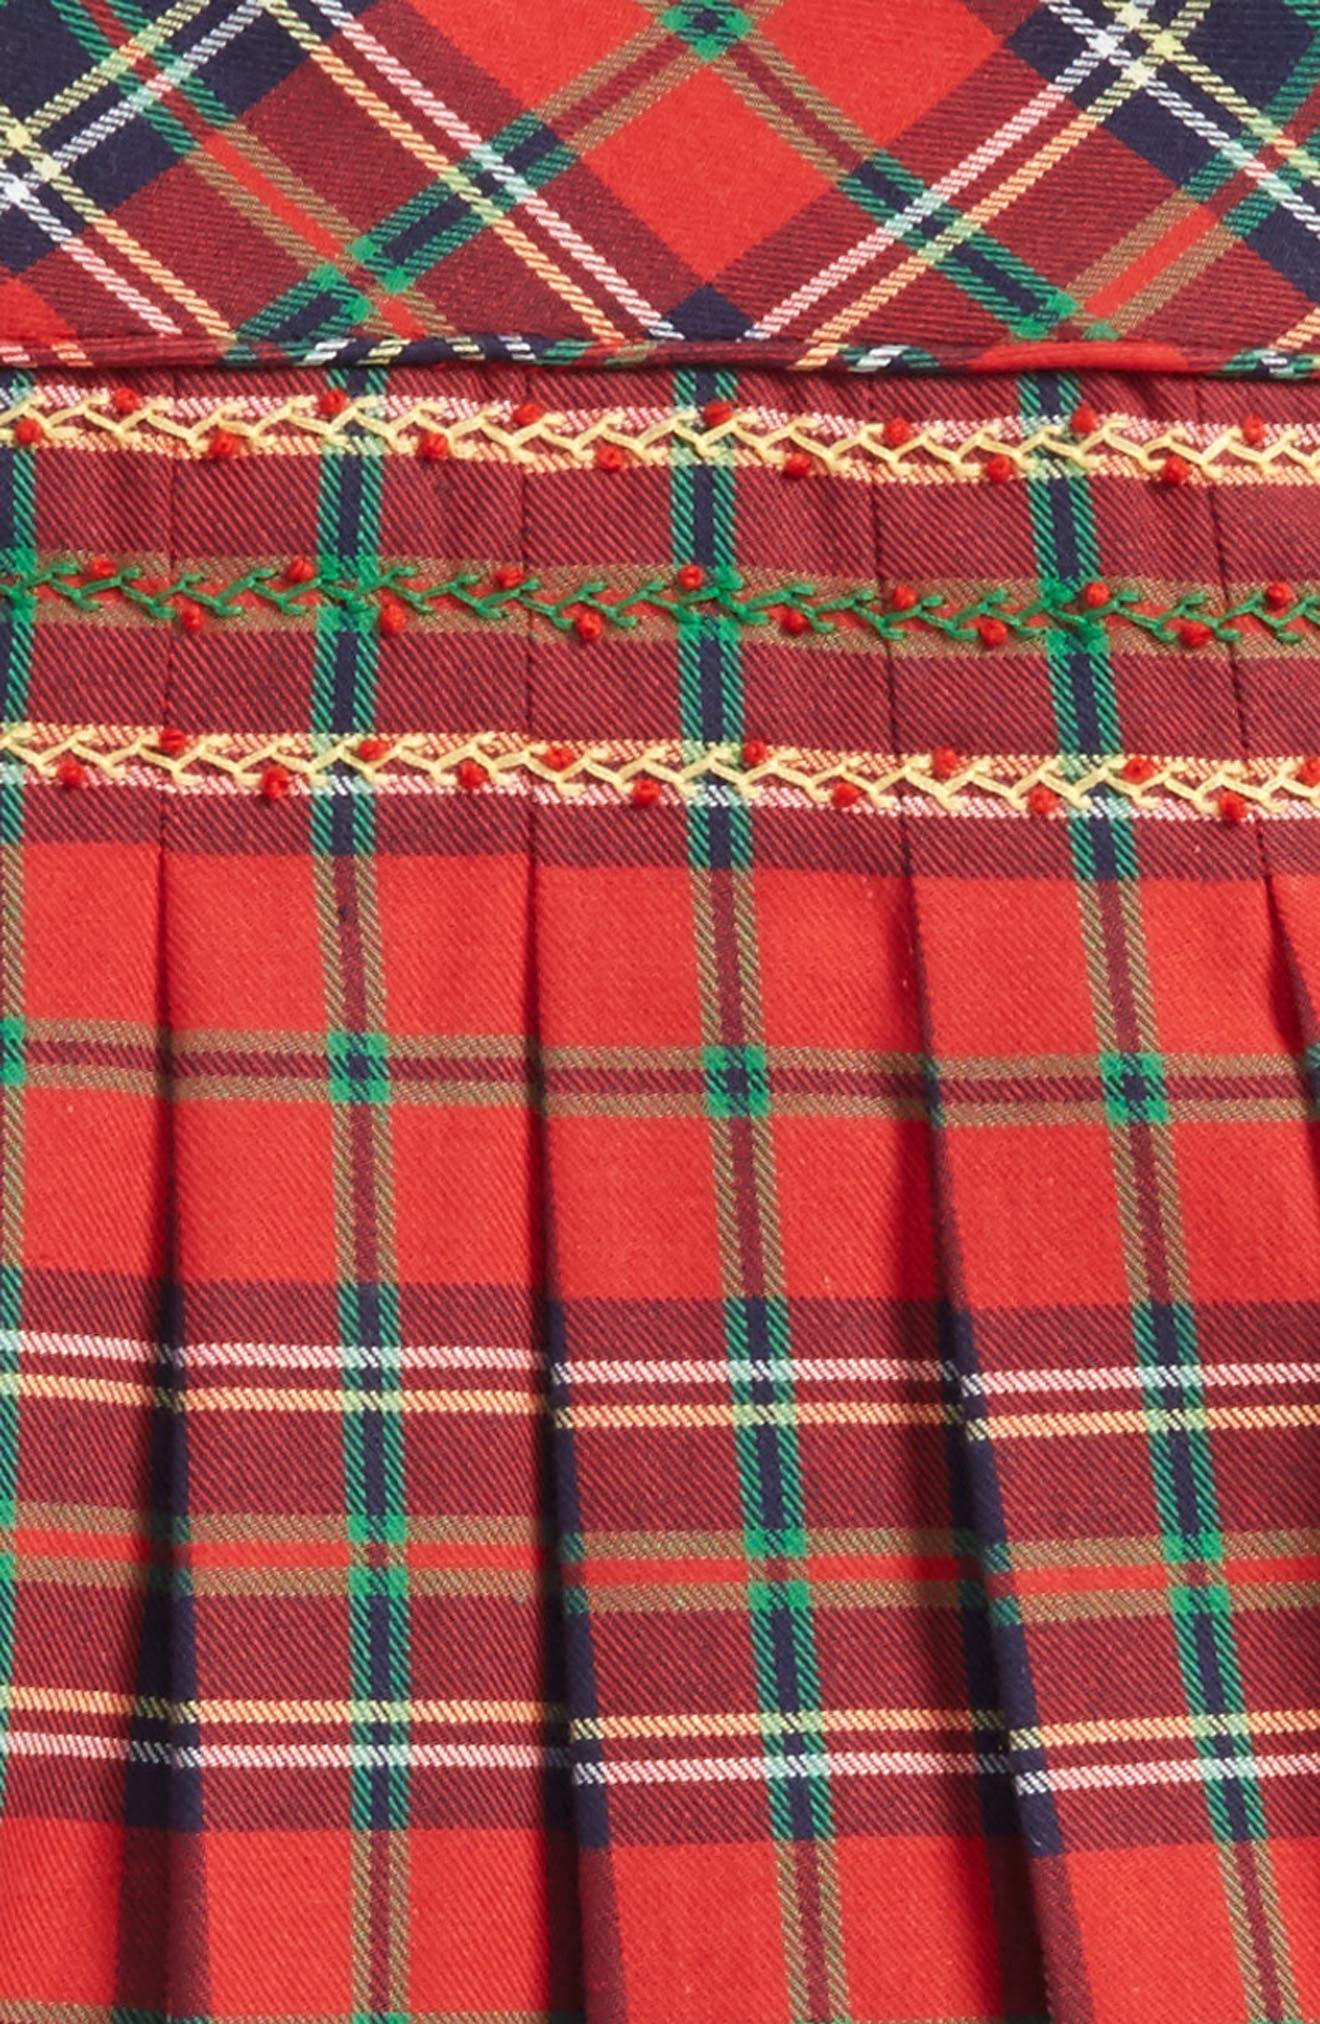 Plaid Pleated Dress,                             Alternate thumbnail 2, color,                             600